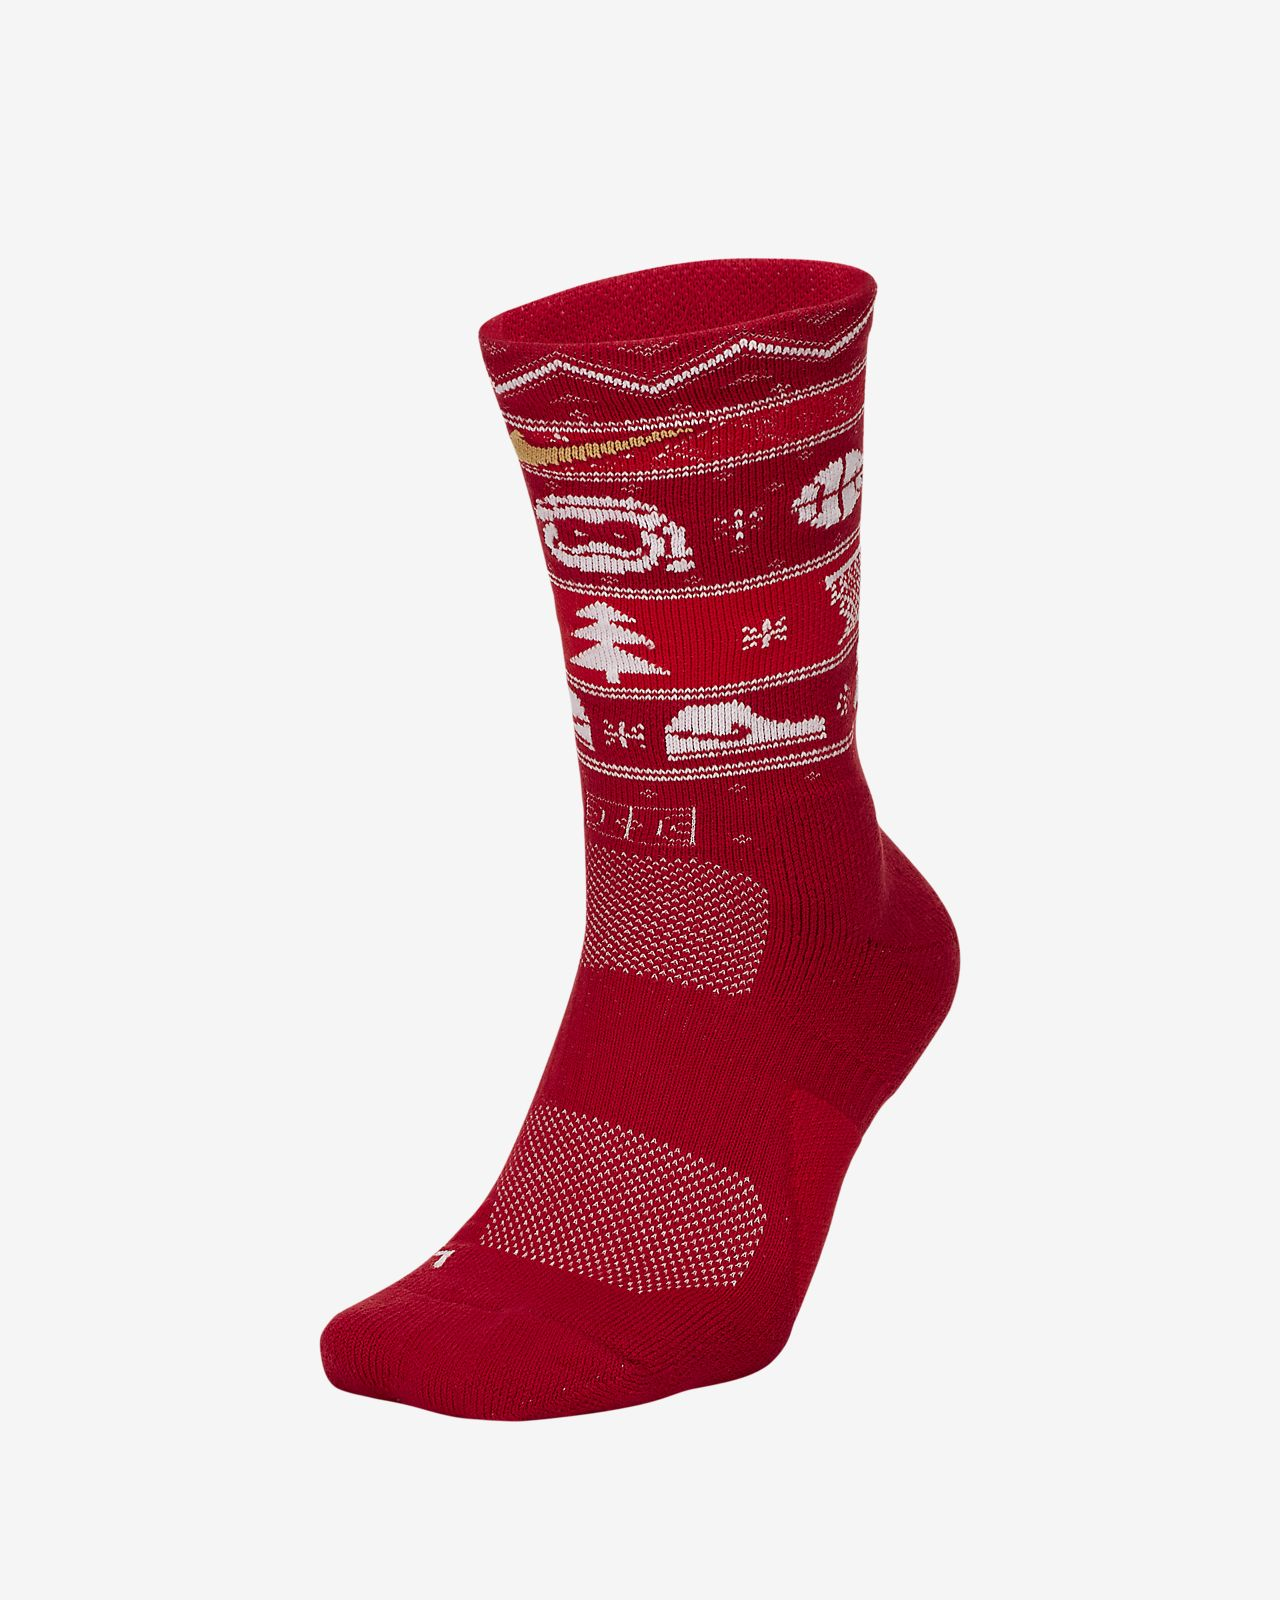 Chaussettes mi-mollet Nike Elite Christmas